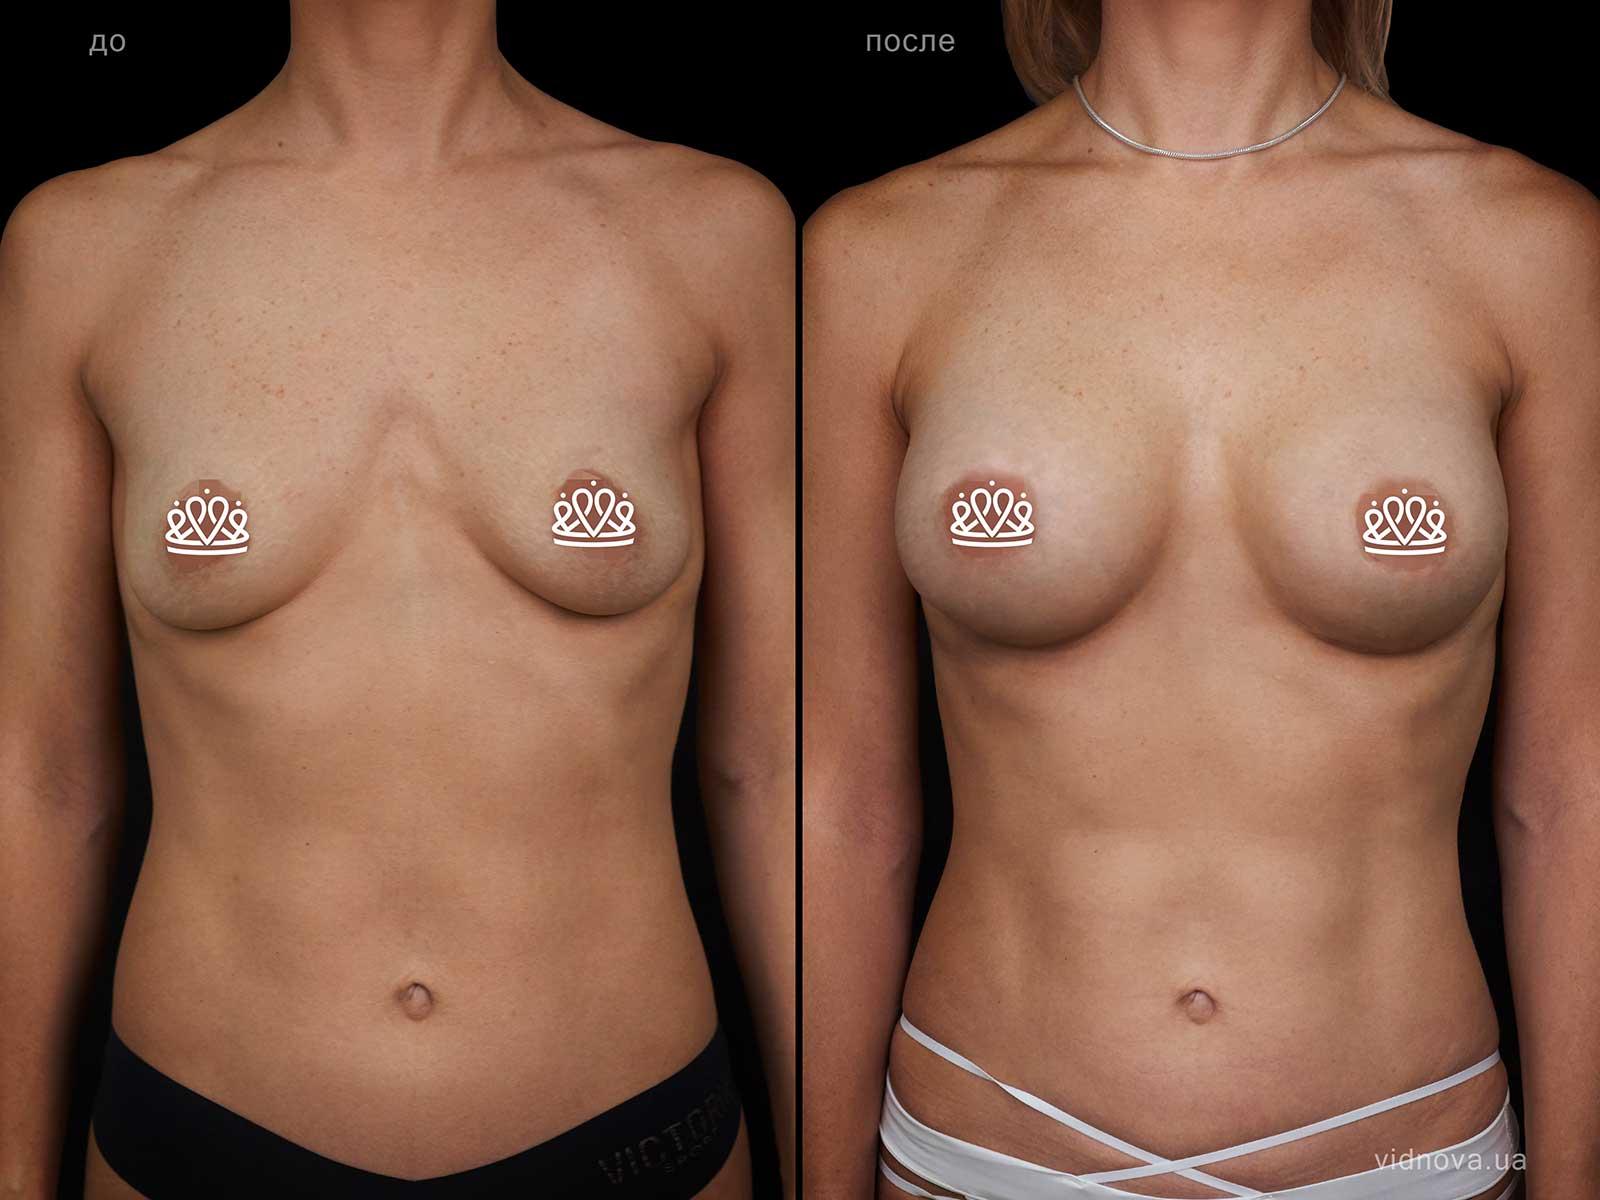 Увеличение груди maket grud rabotenko 01 s